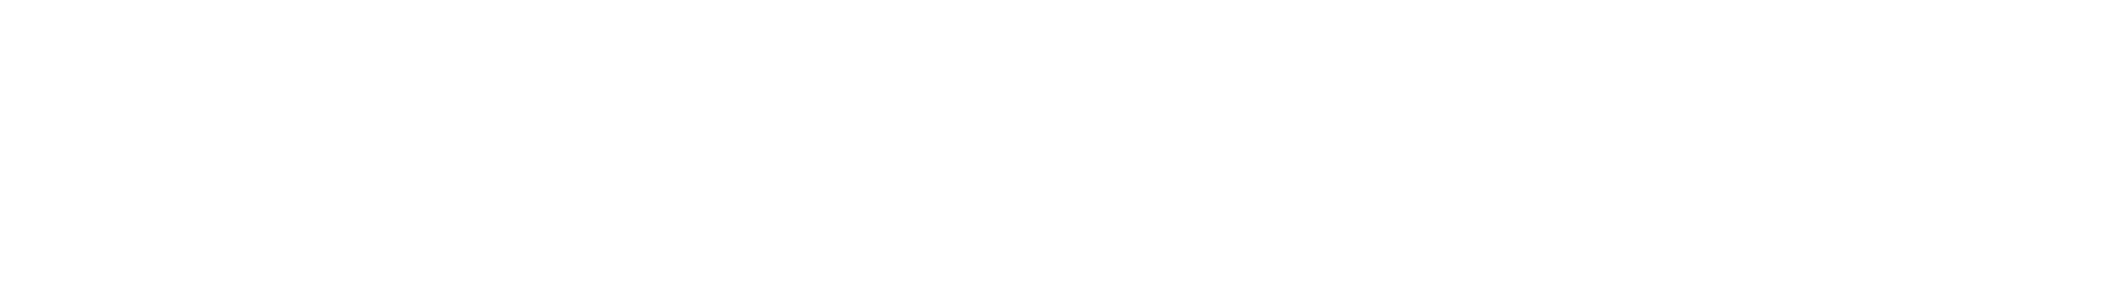 lesmills content video workout main logo